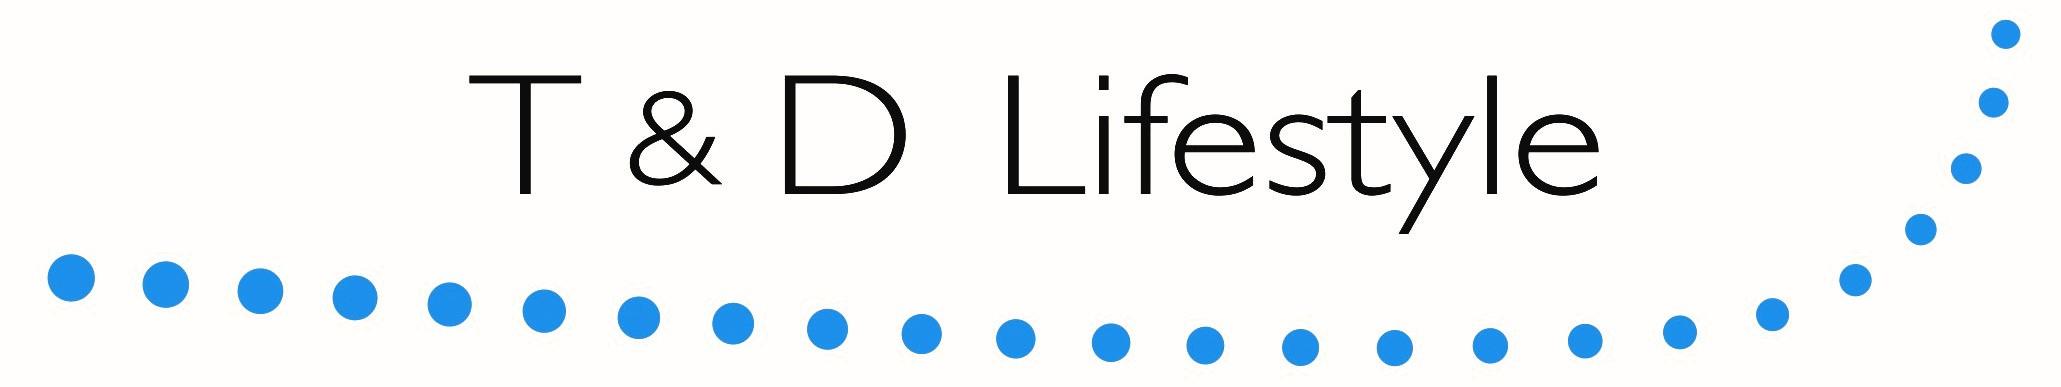 TD Lifestyle-Logo